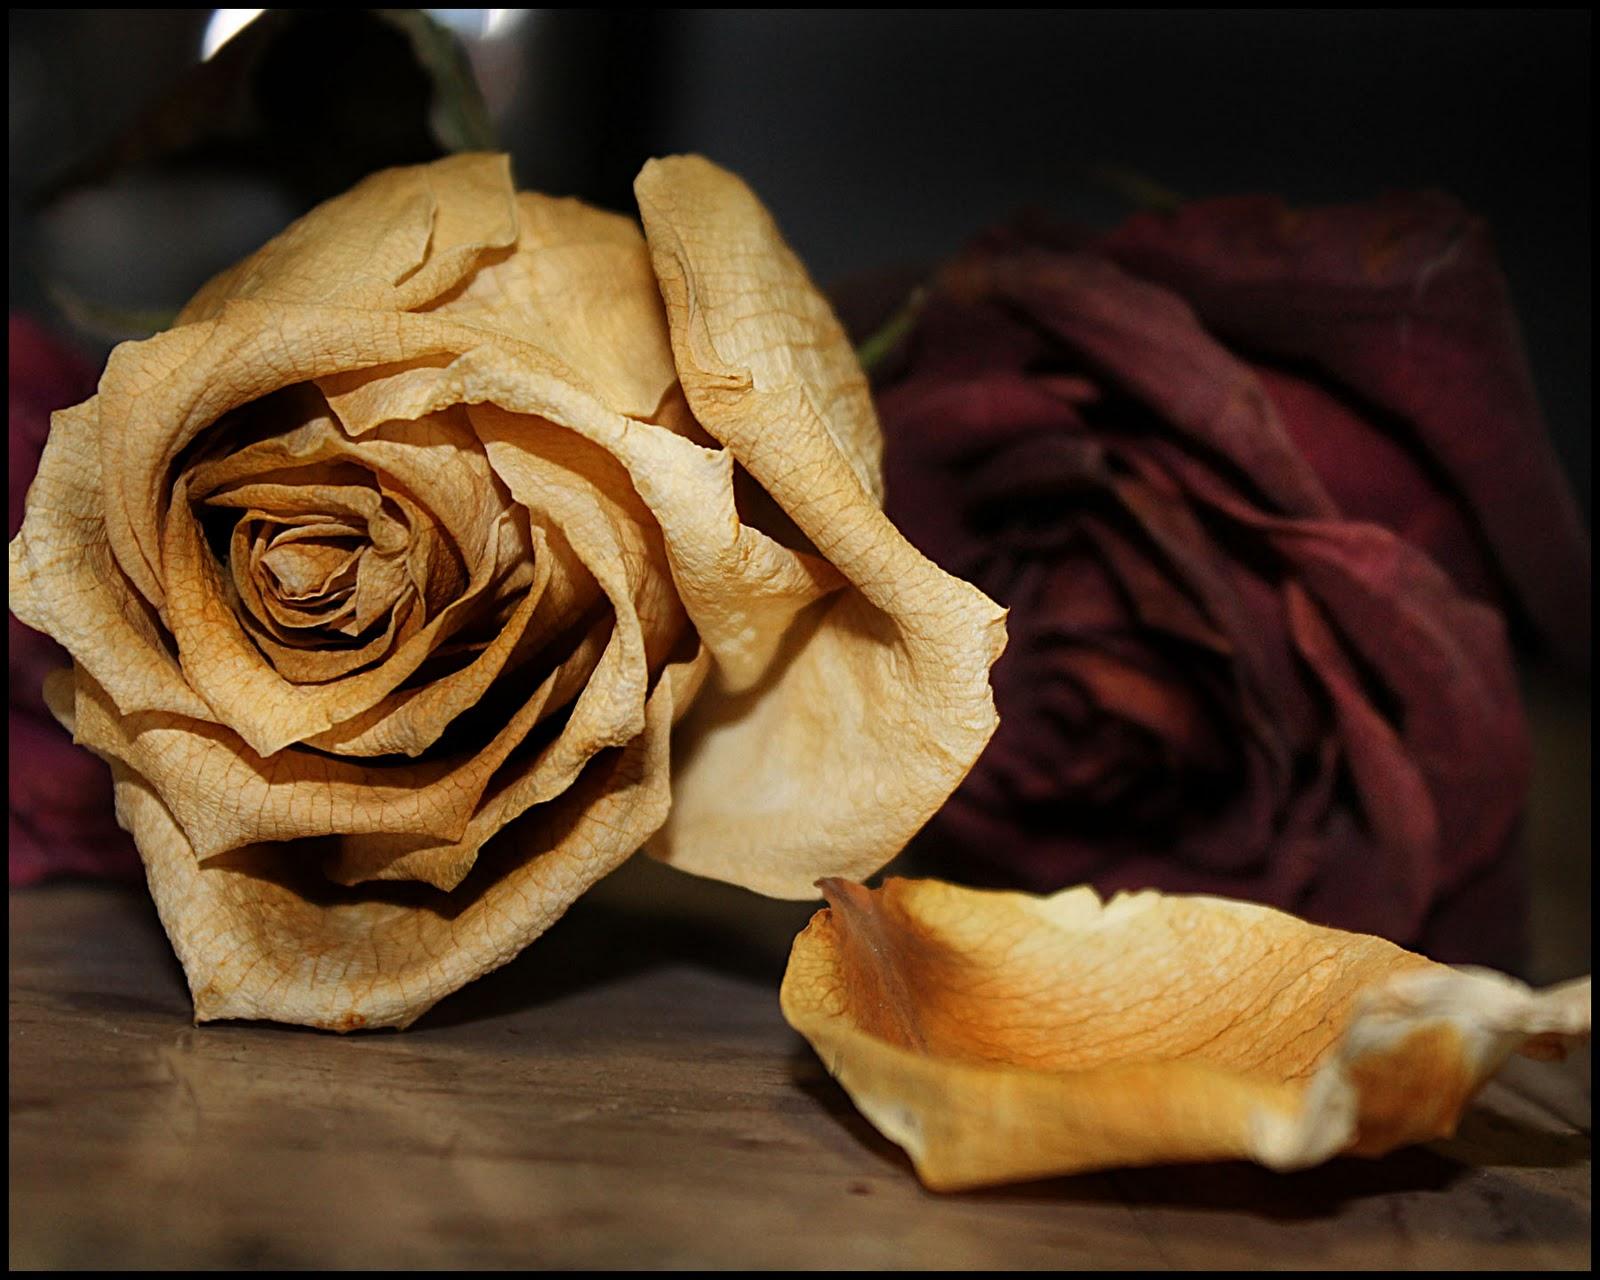 Michaela Shipman Digital Artist And Photographer Dead Roses